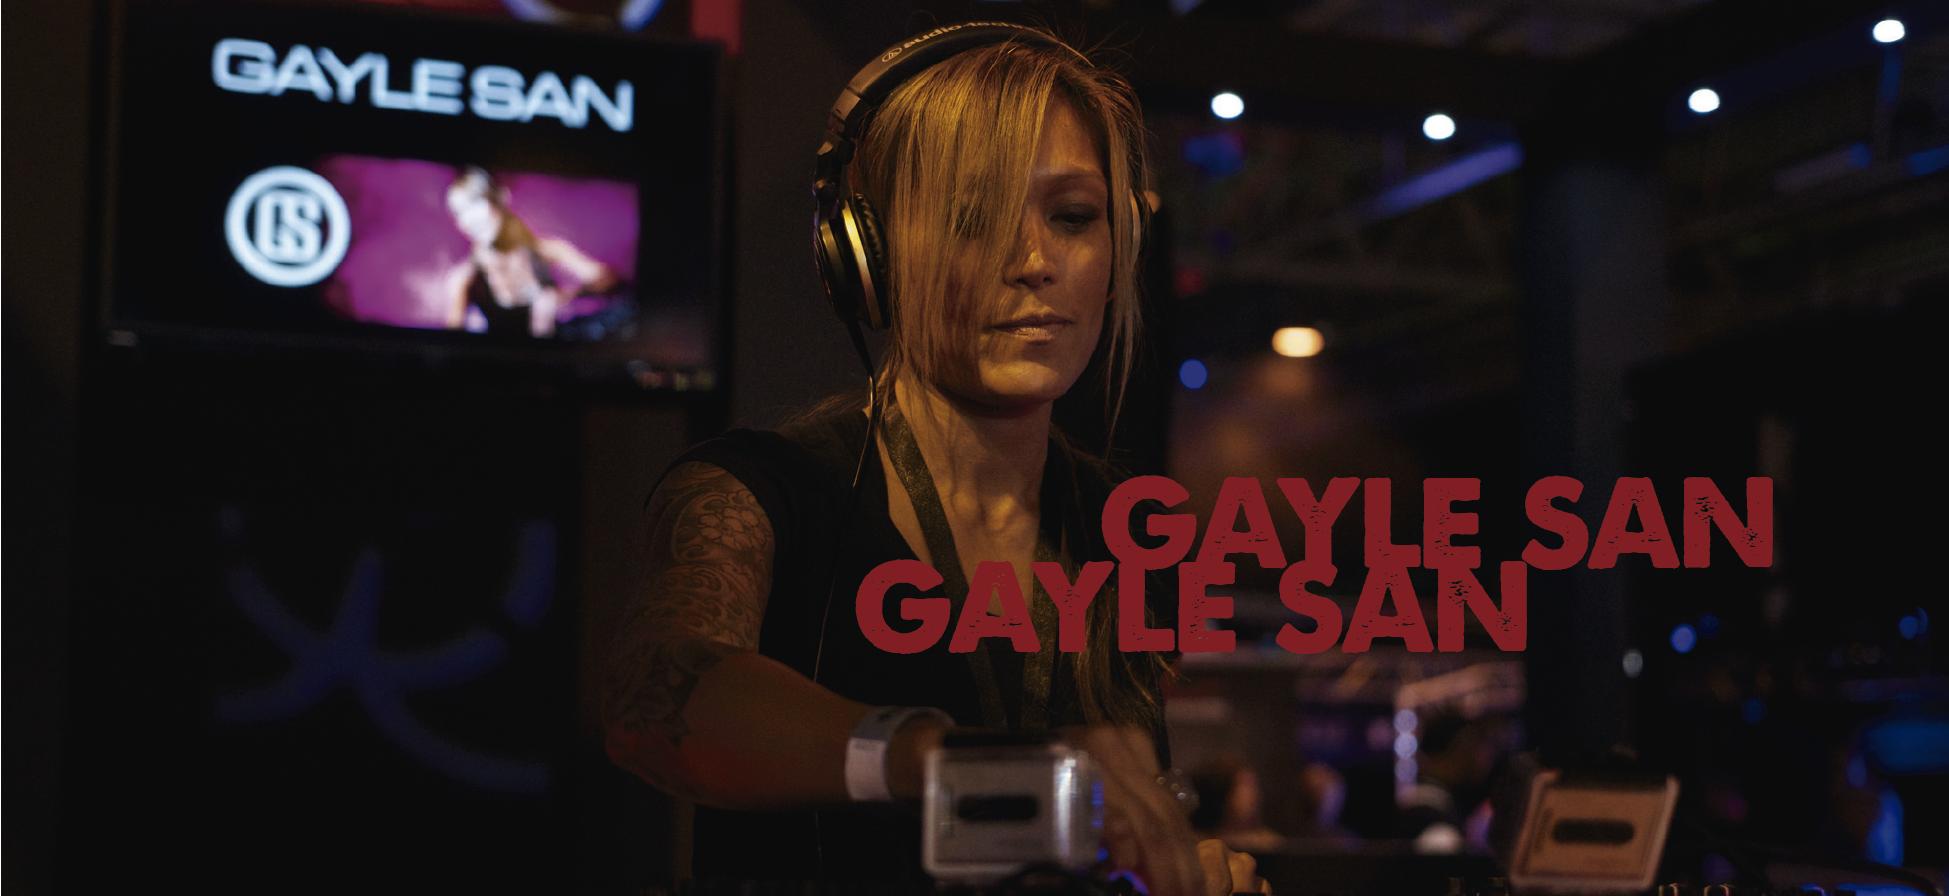 Profile: GAYLE SAN